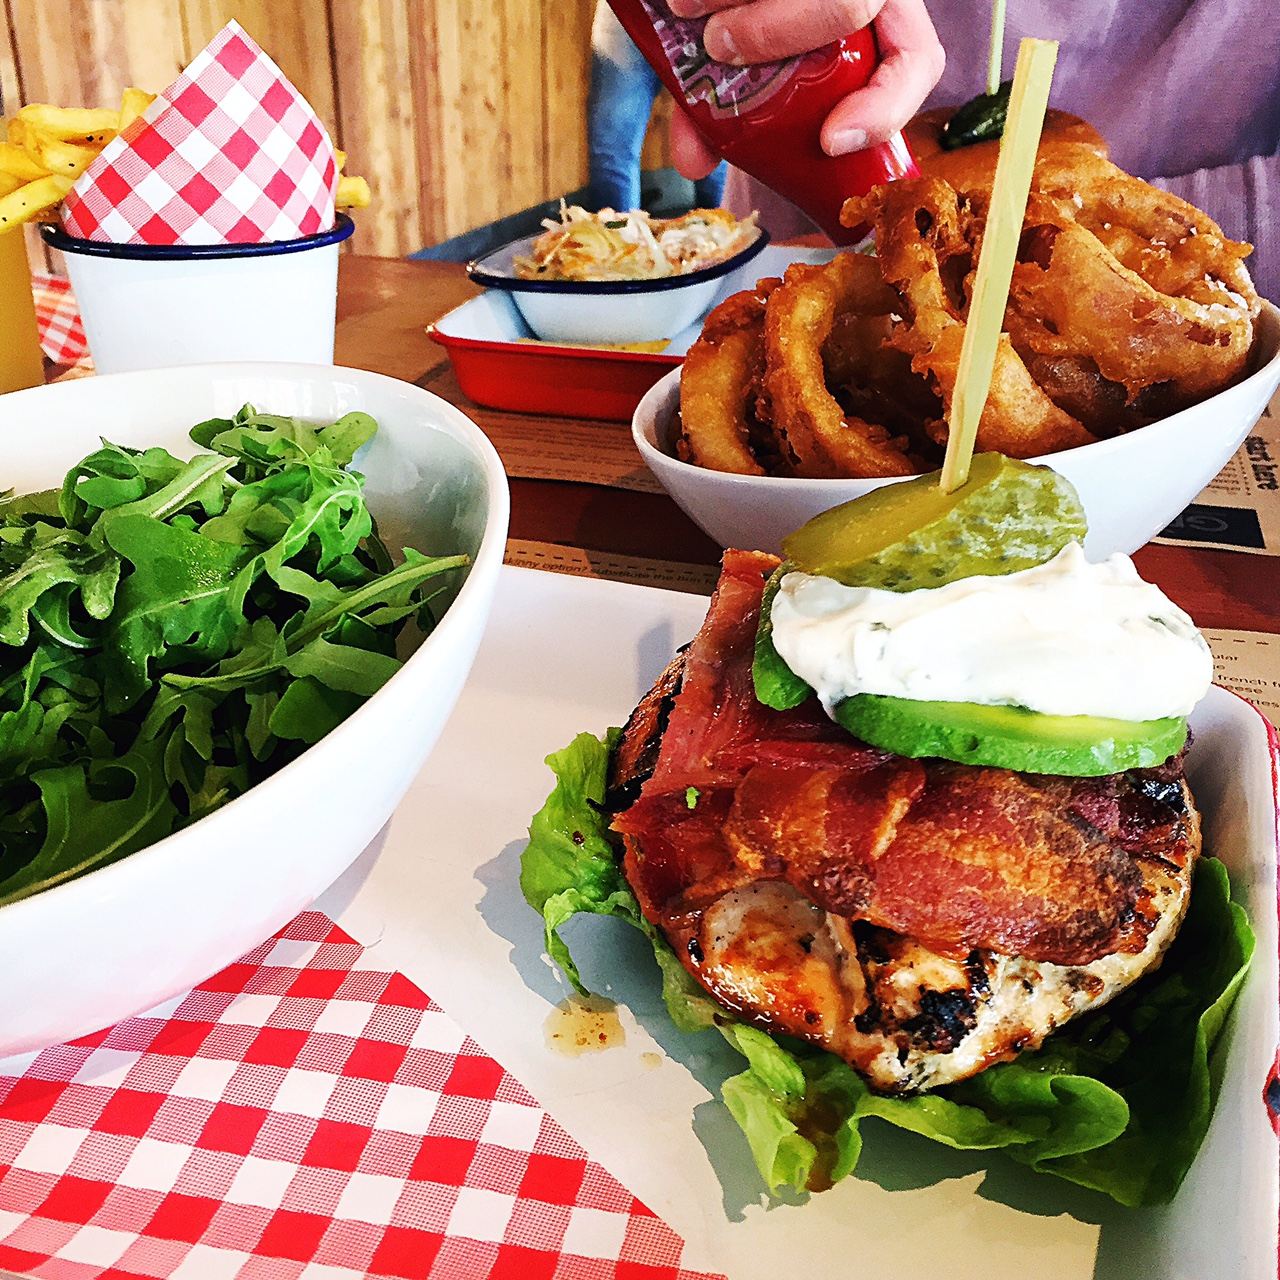 blog-chelt-cheltenham-food-chicken-burger-bar-grid-iron-grill-dinner-restaurant-review.jpeg